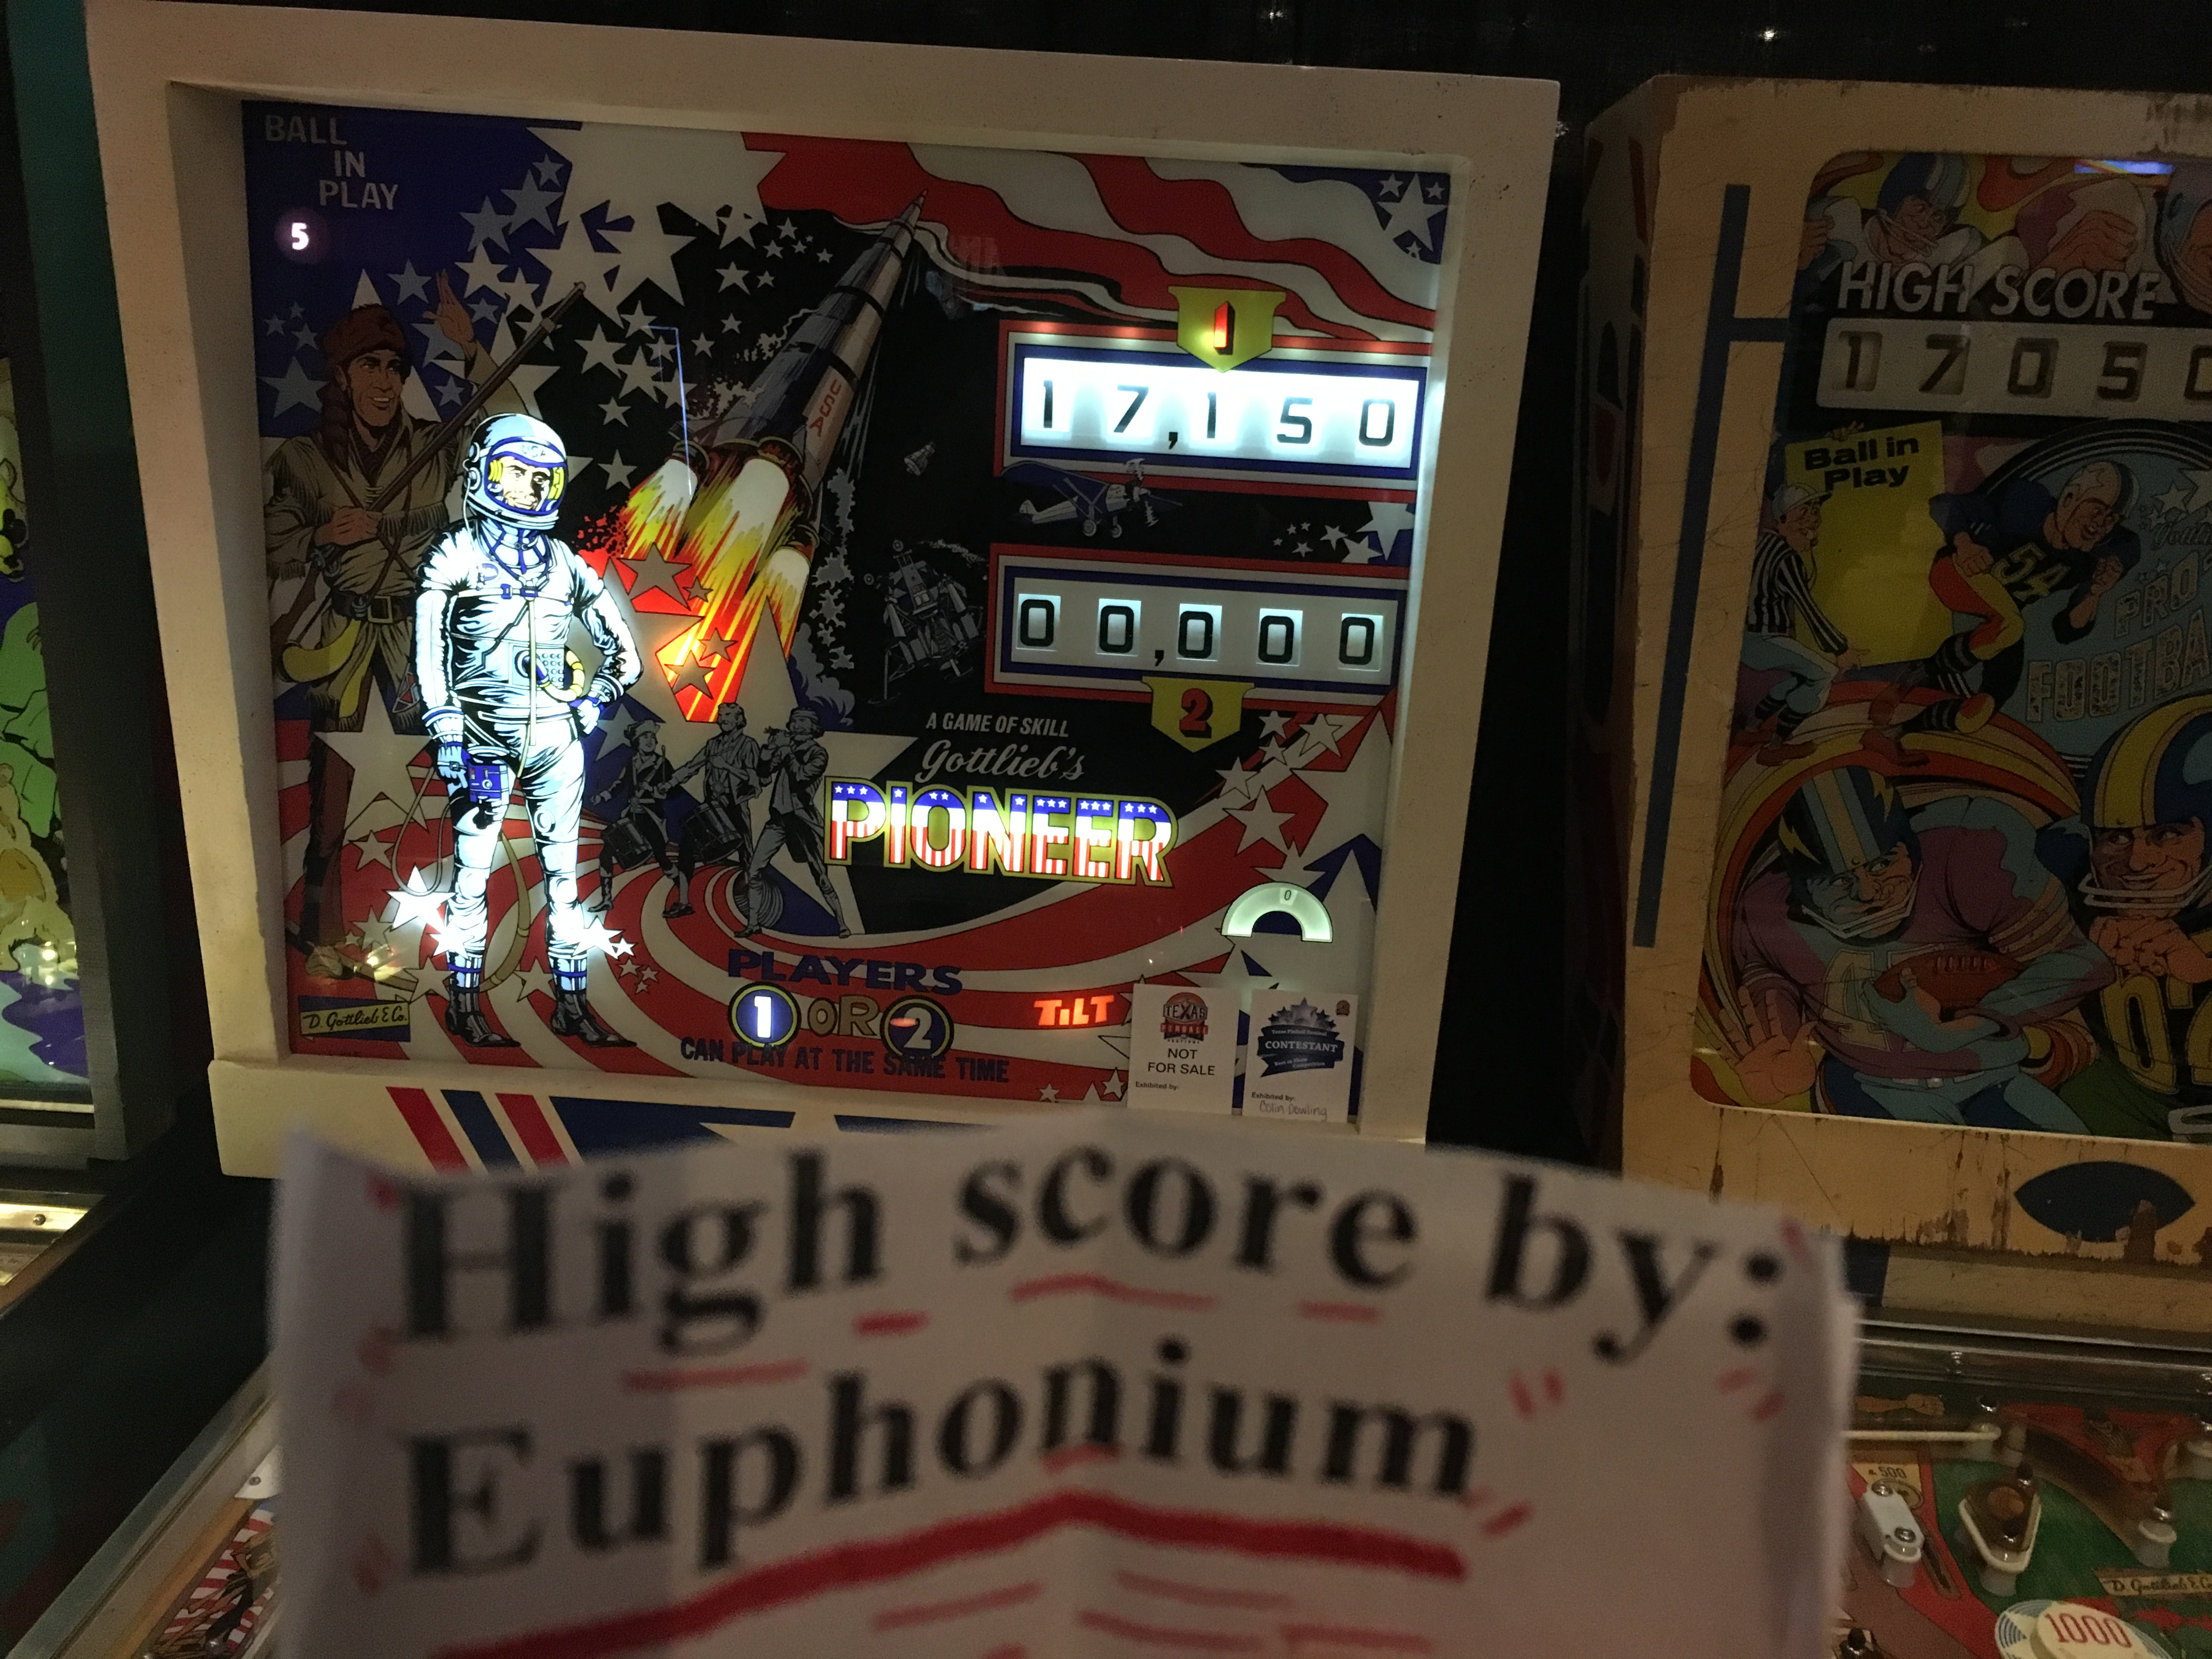 euphonium: Pioneer (Pinball: 5 Balls) 17,150 points on 2018-03-18 21:26:11